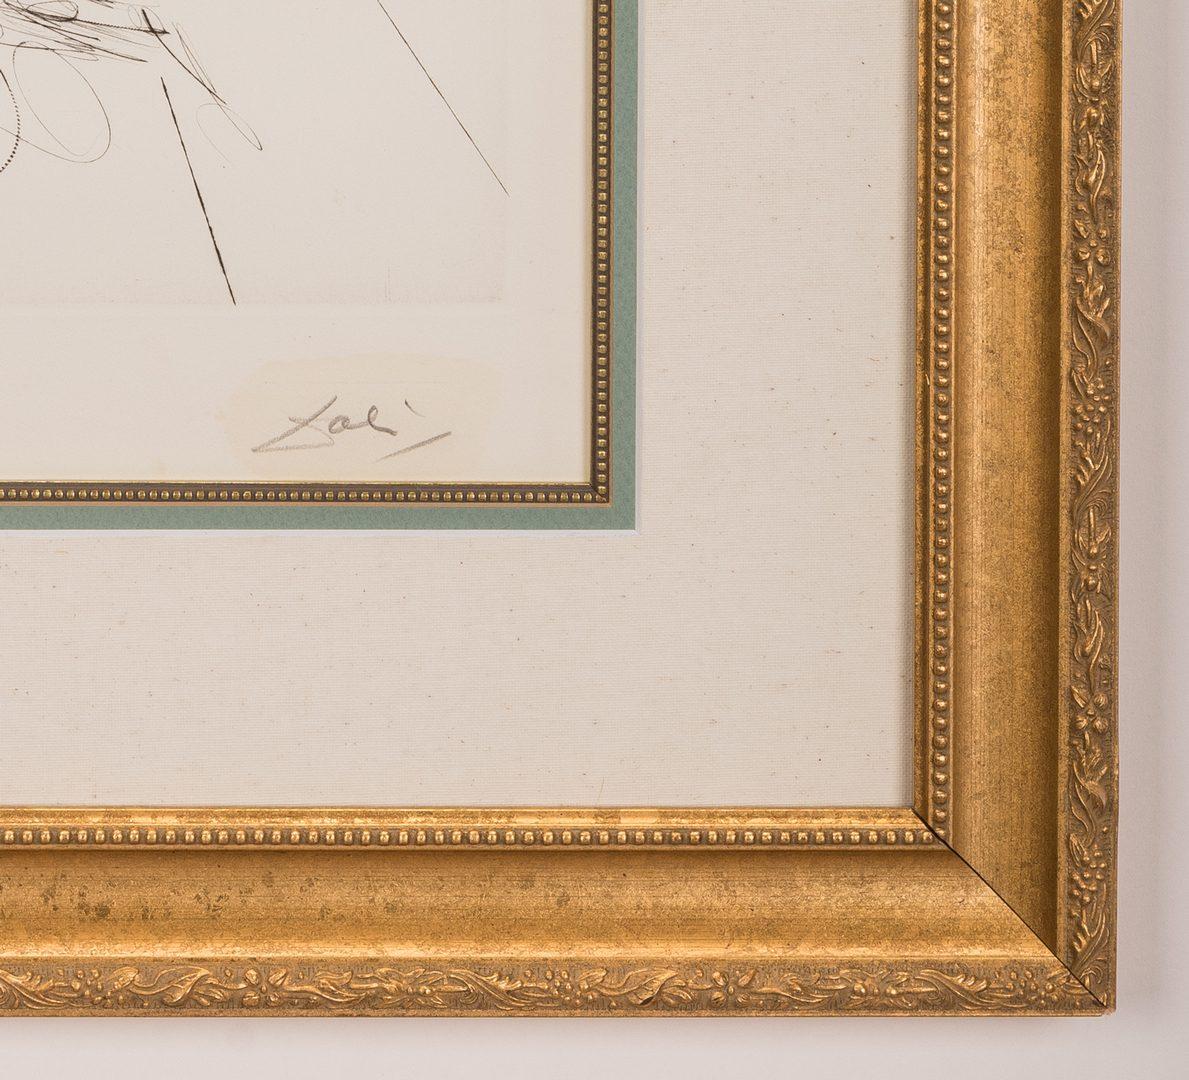 Lot 464: Salvador Dali Apricot Chevalier Litho